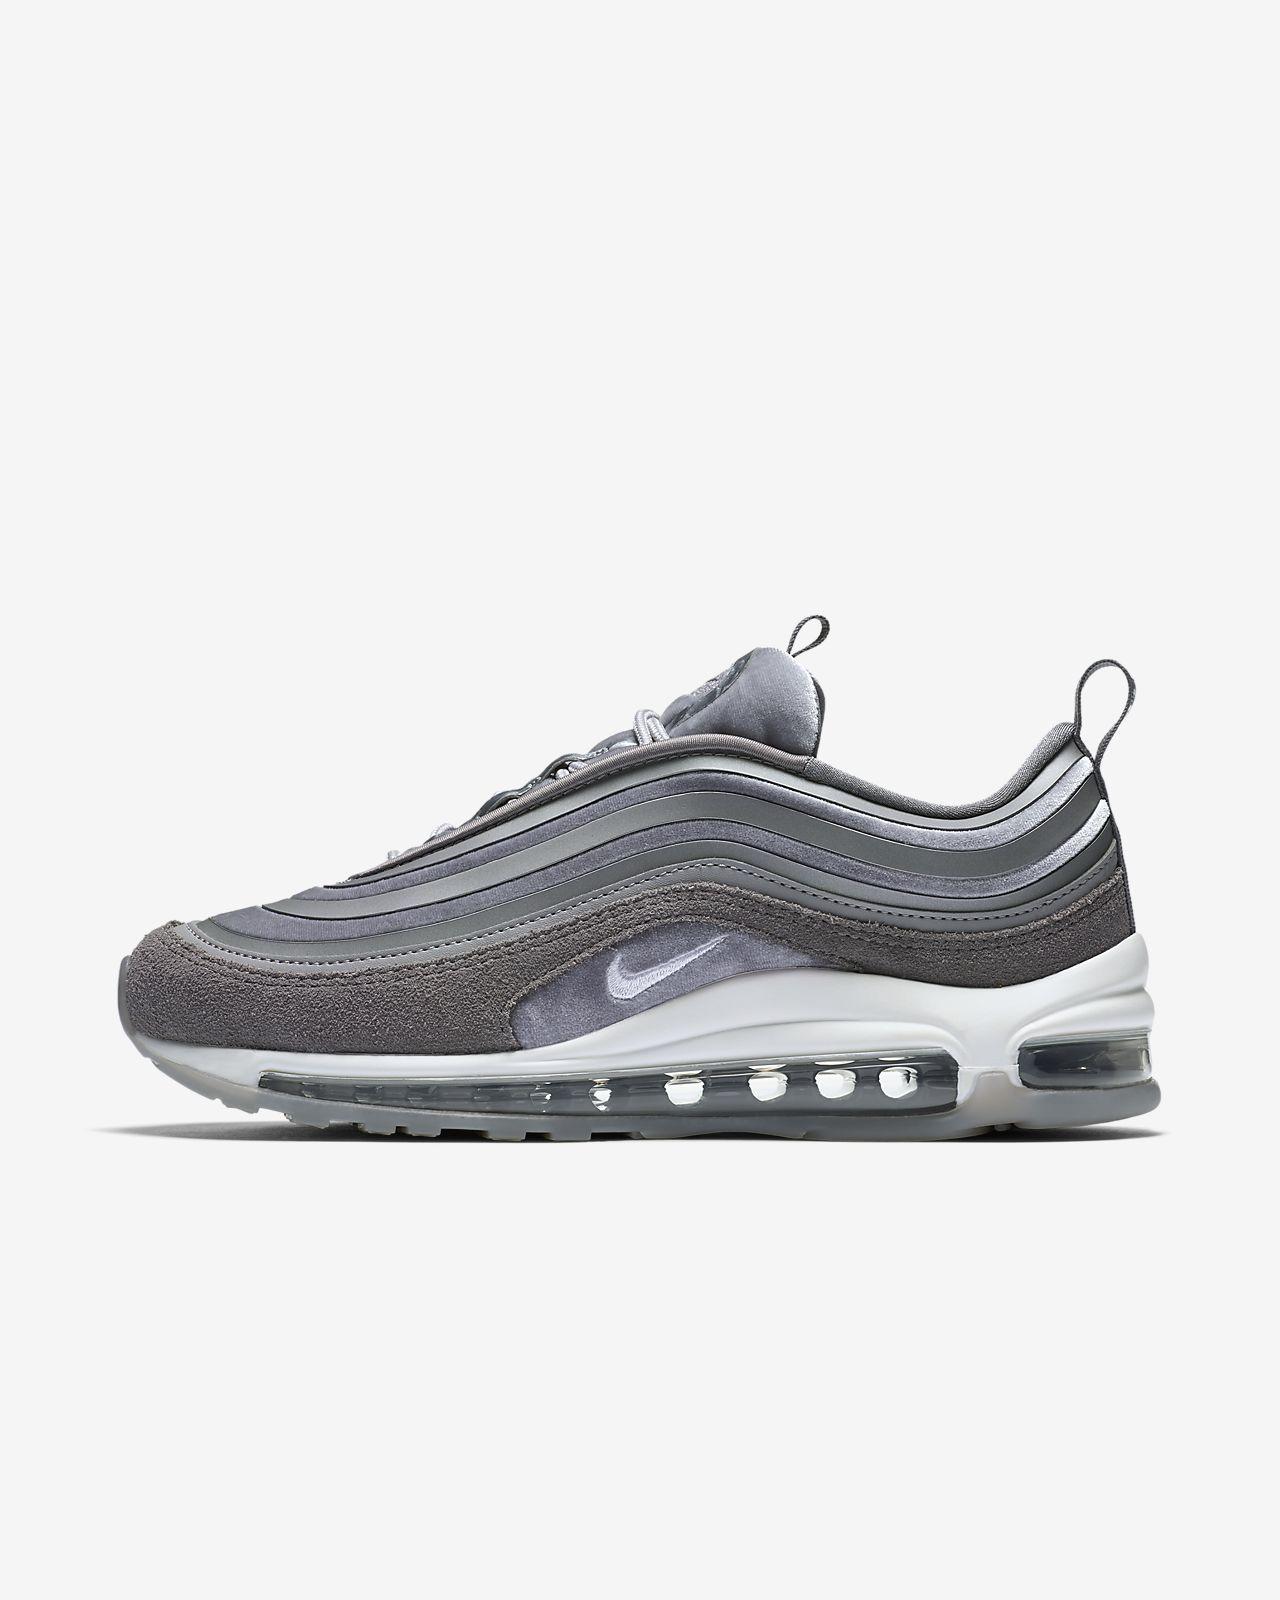 ac00218b92 ... nike air max 97 ultra 17 lx womens shoe